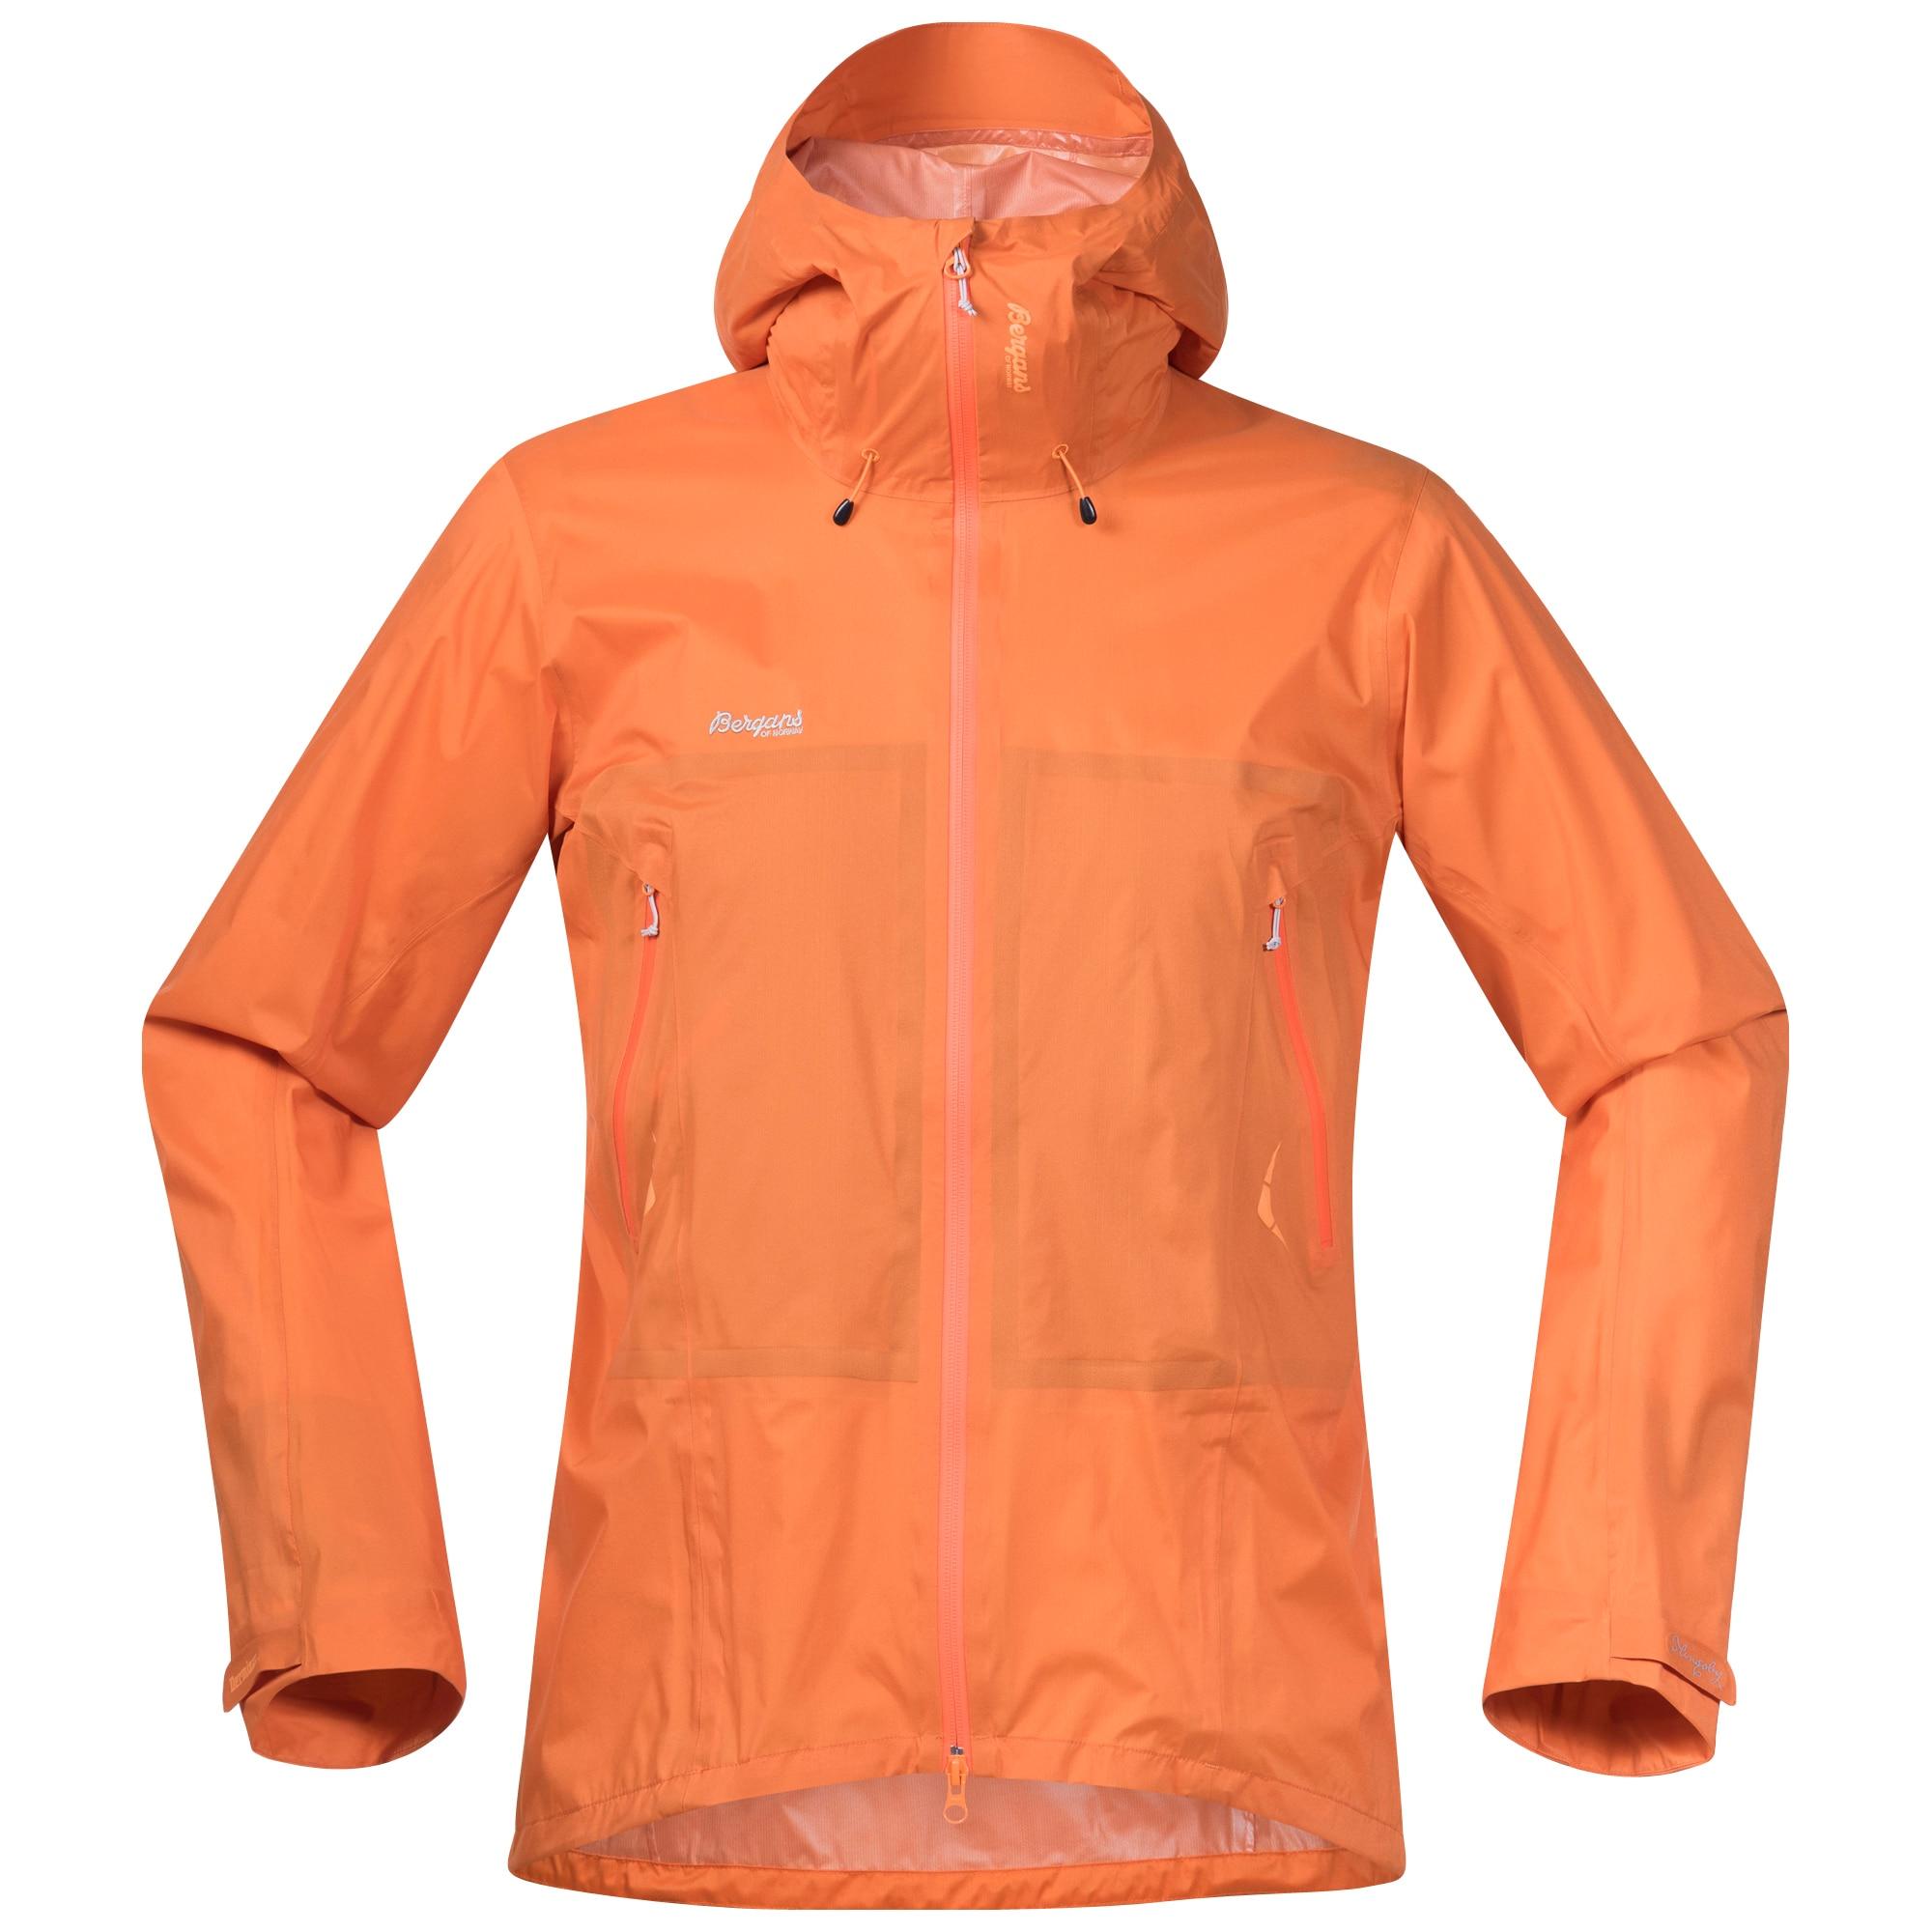 Miendalstind Jacket